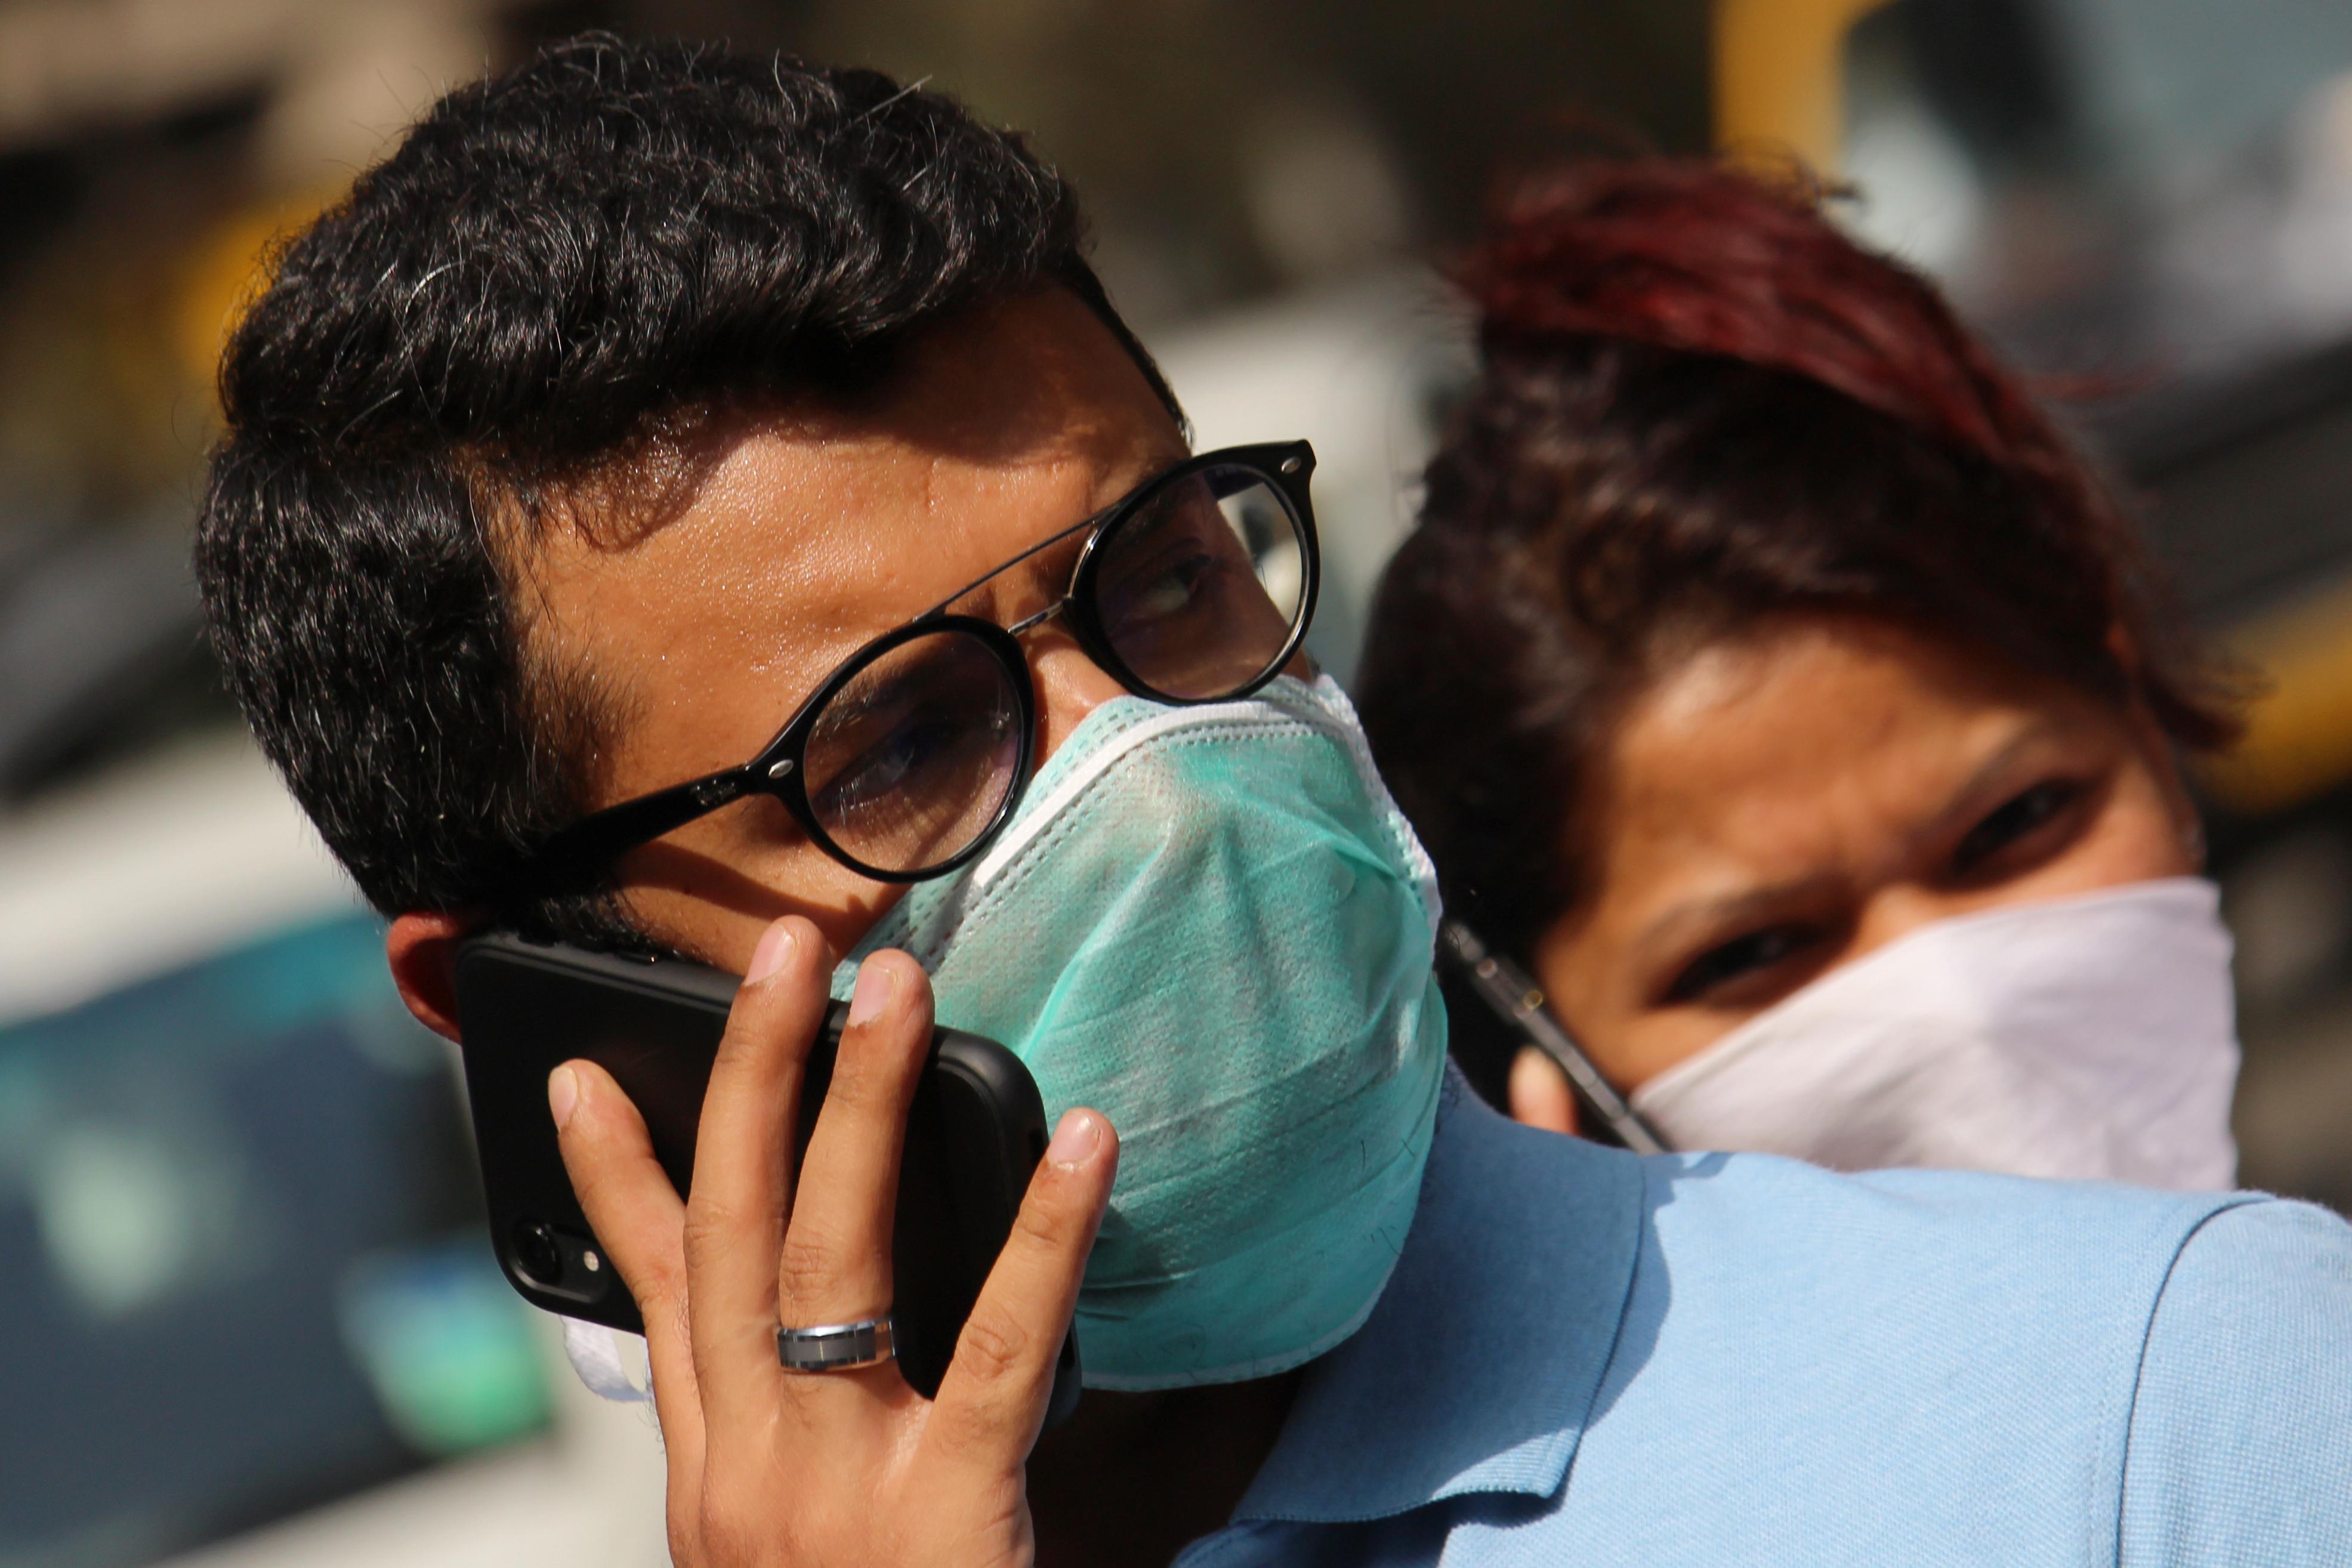 Telecom Operators In India Warn People Of Coronavirus Outbreak